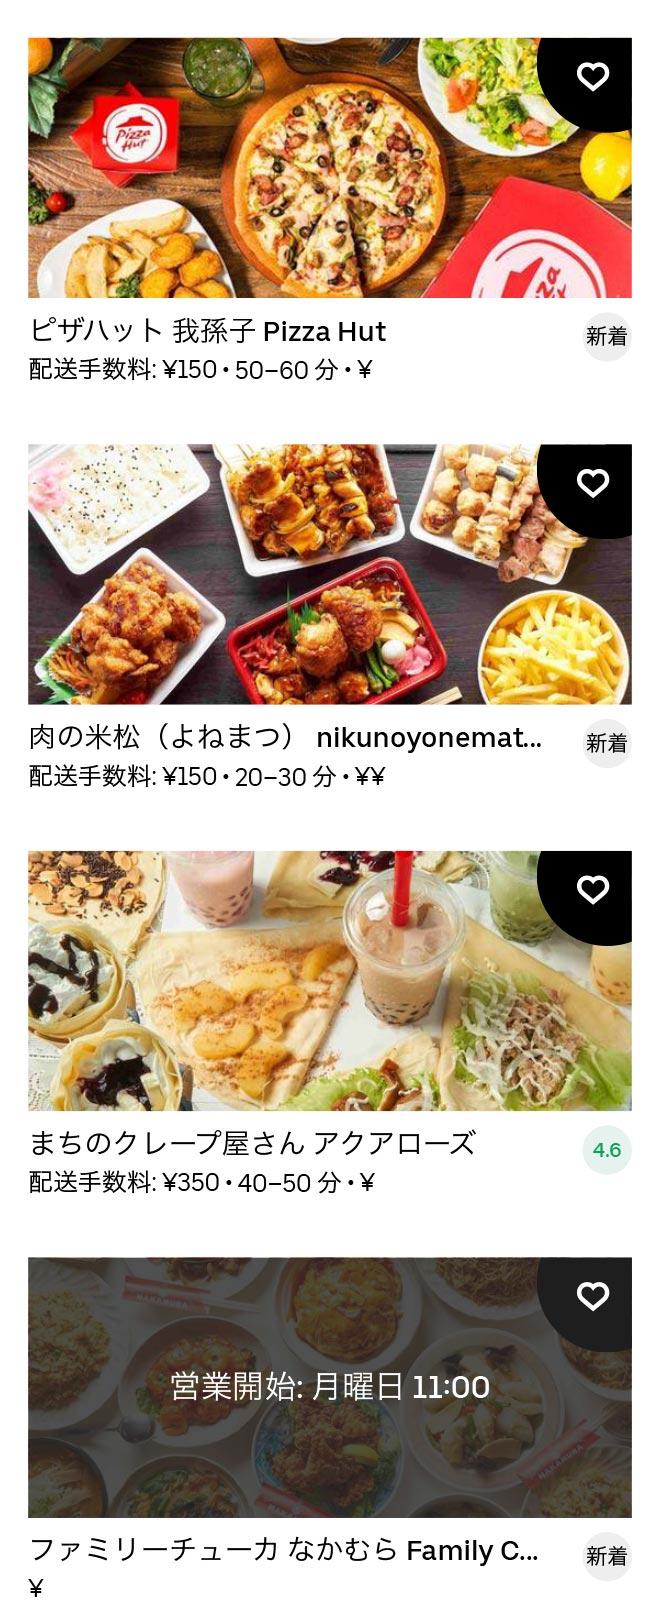 Abiko menu 2011 09